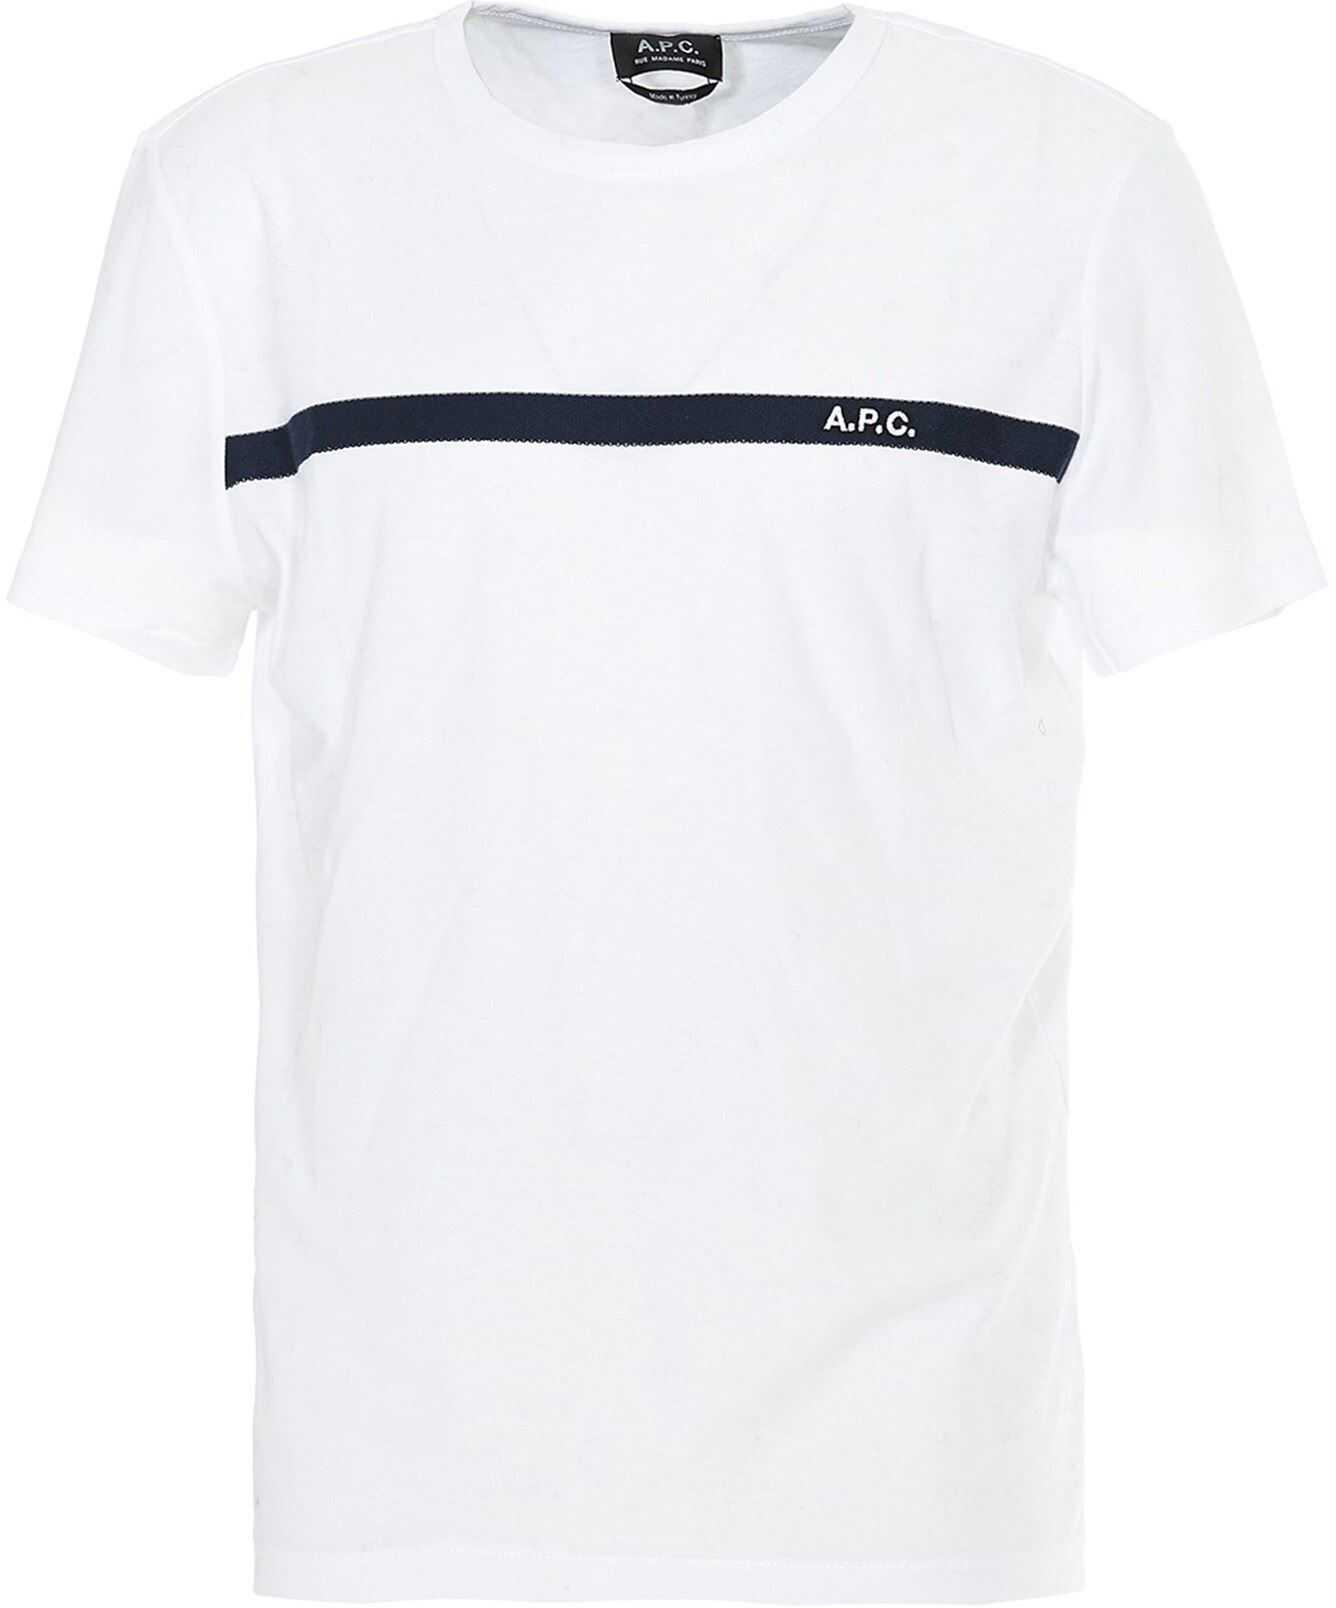 Yukata Logo Band White T-Shirt